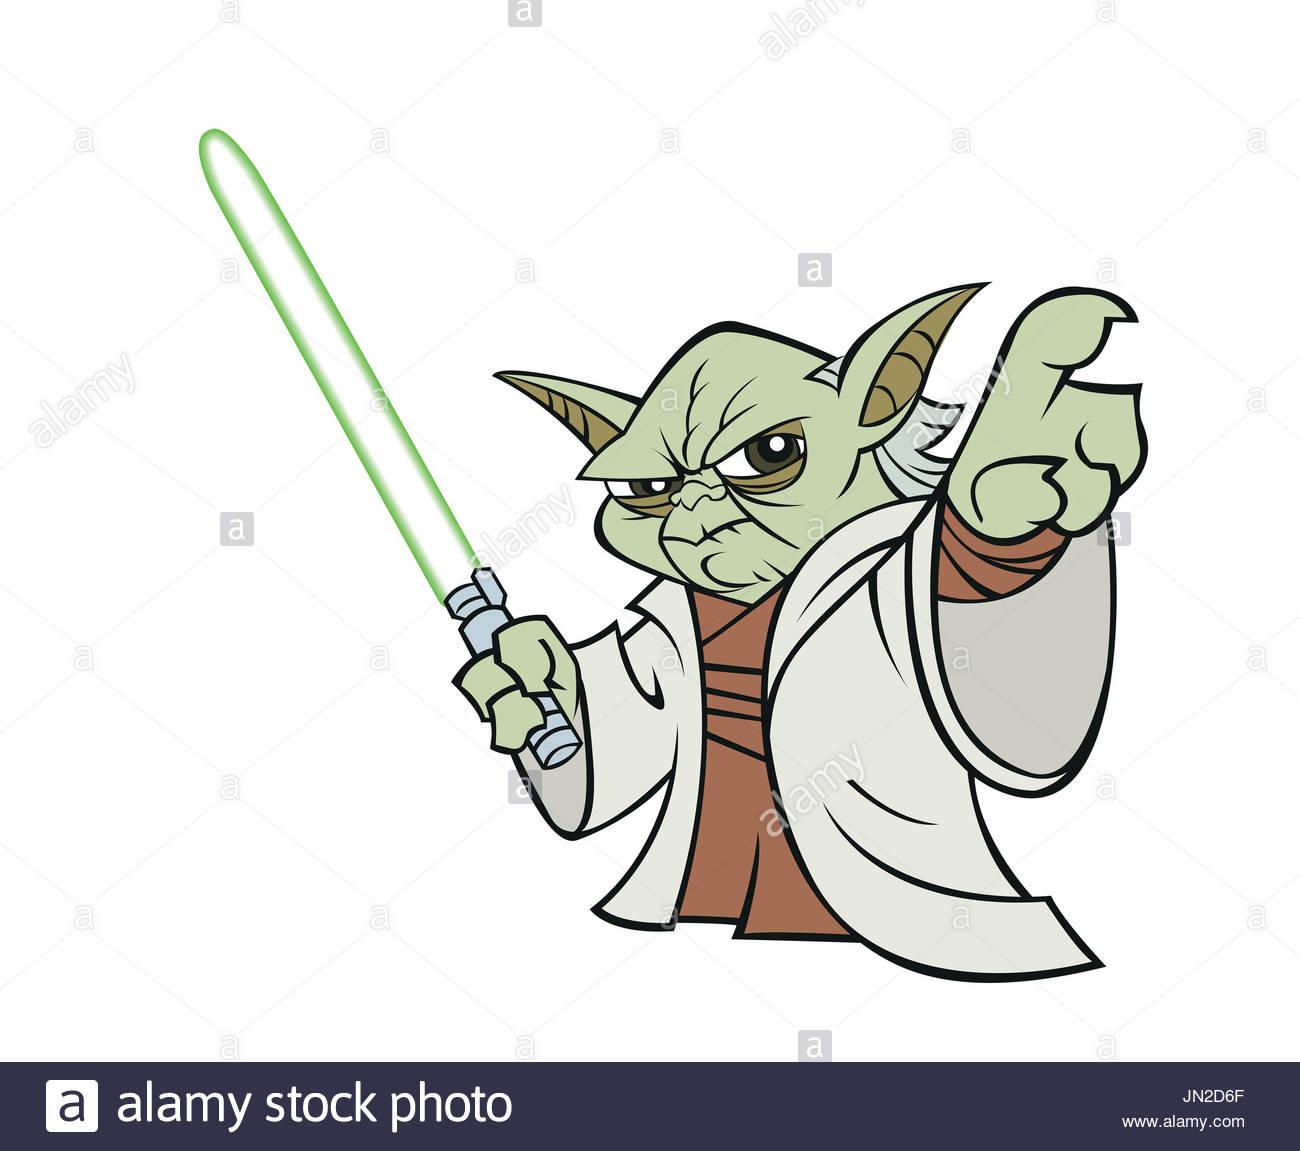 Master Yoda Stock Photos Amp Master Yoda Stock Images